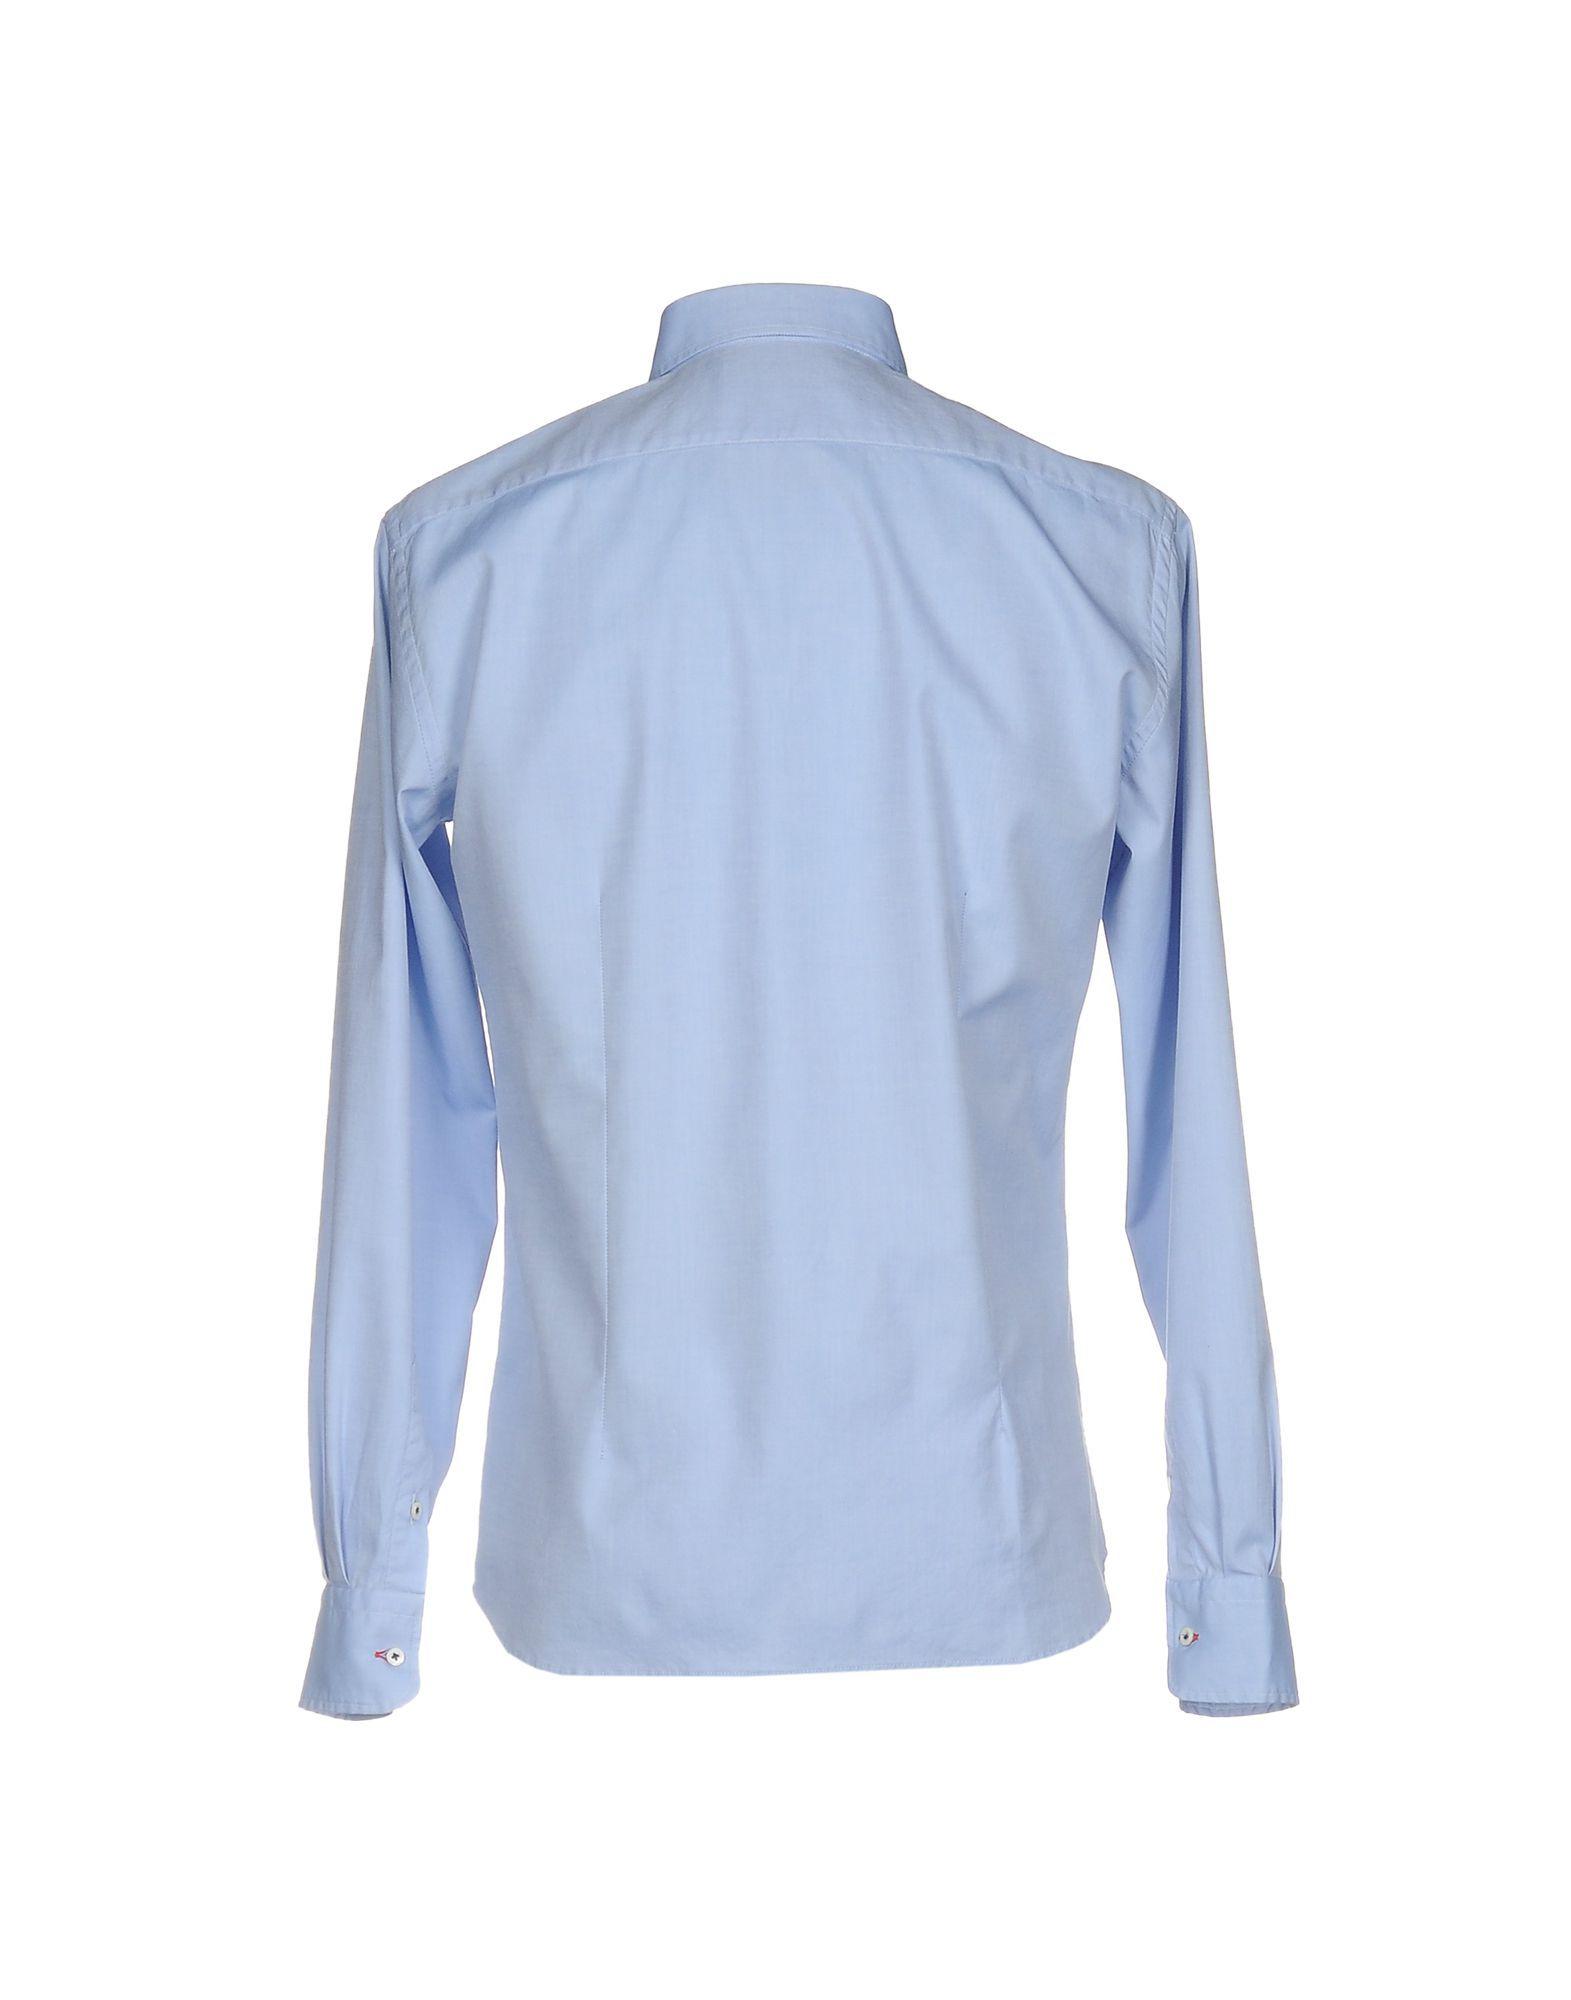 Aglini Sky Blue Cotton Shirt